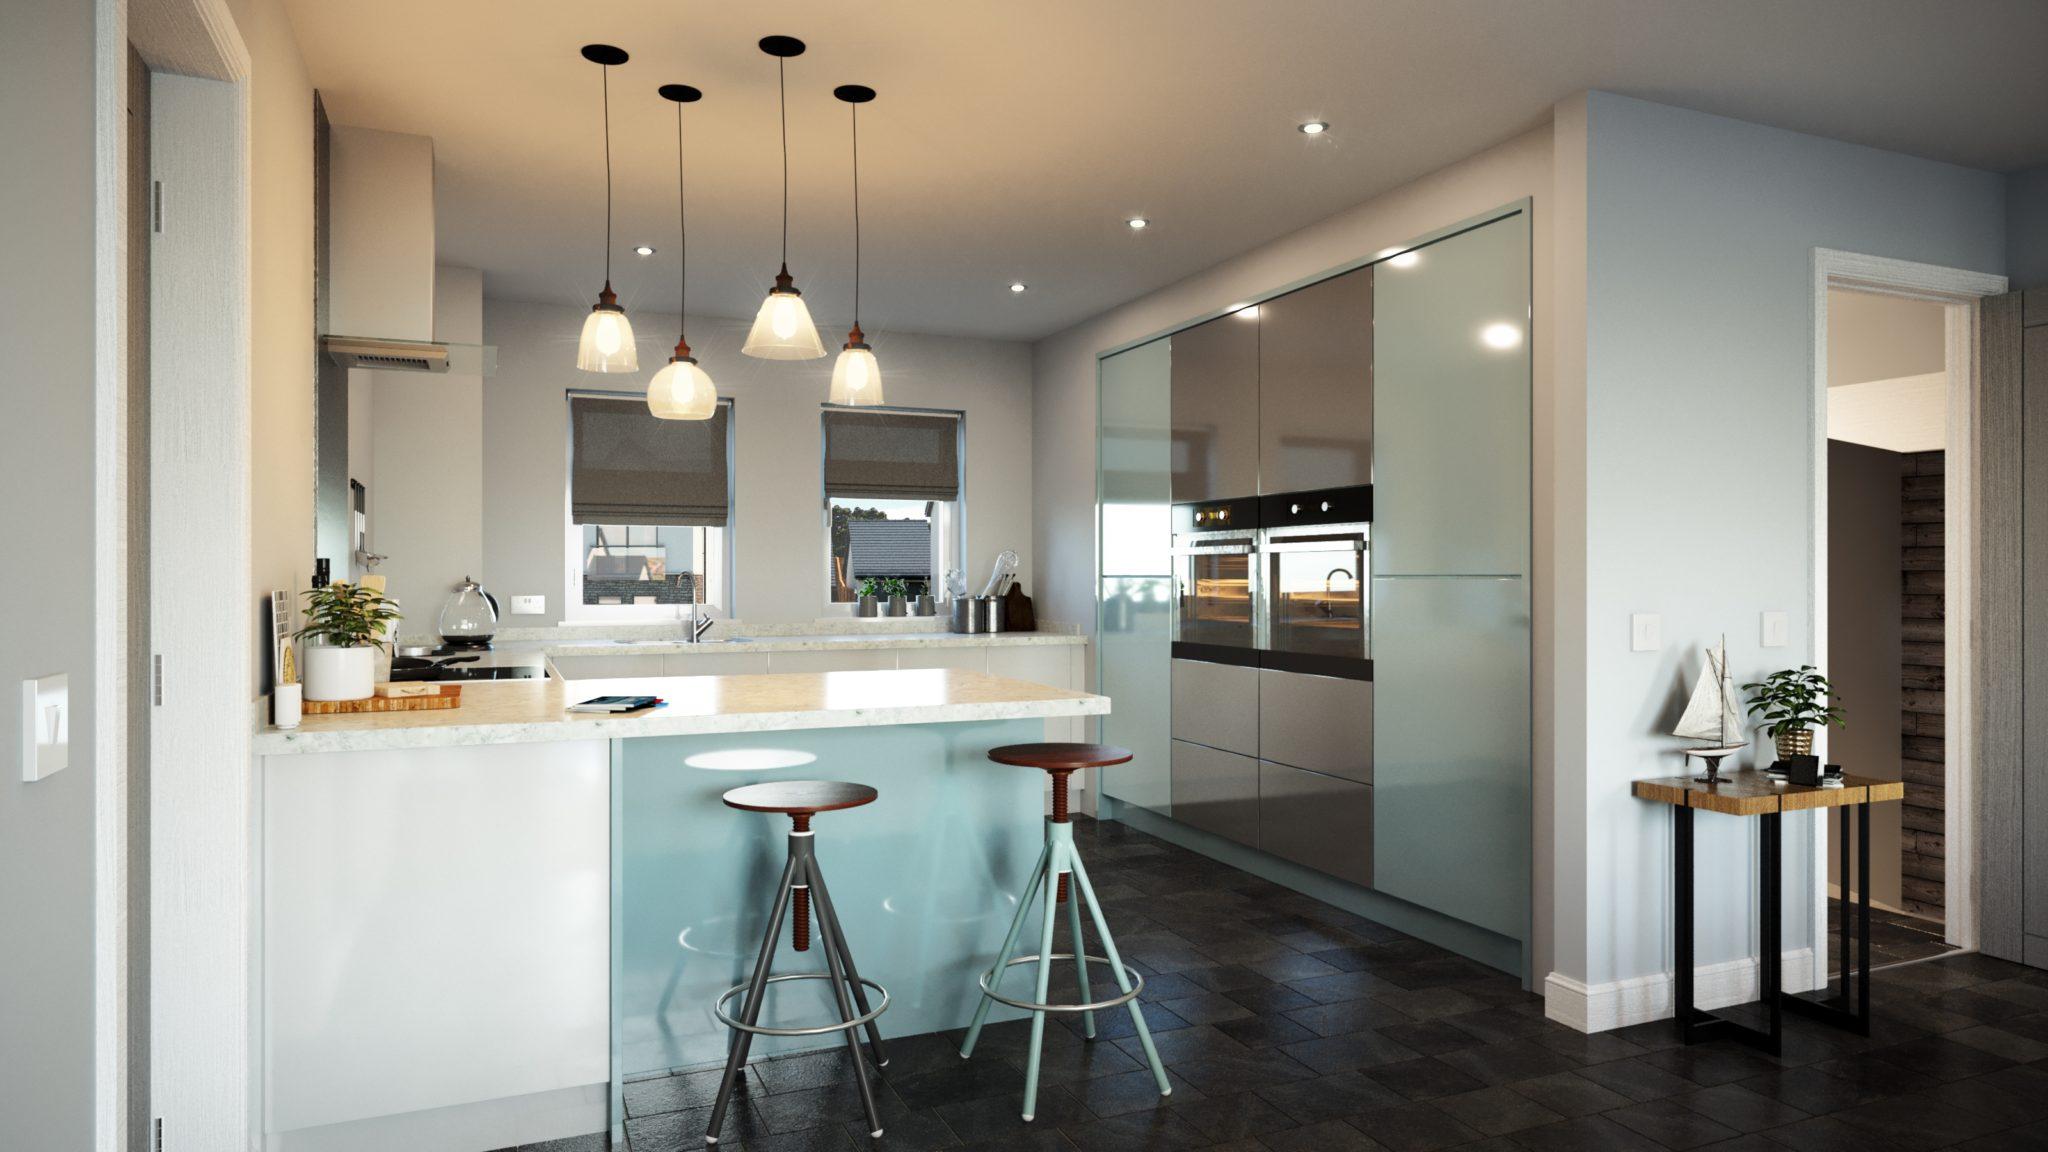 Broadhaven-Kitchen-HiRes_fast